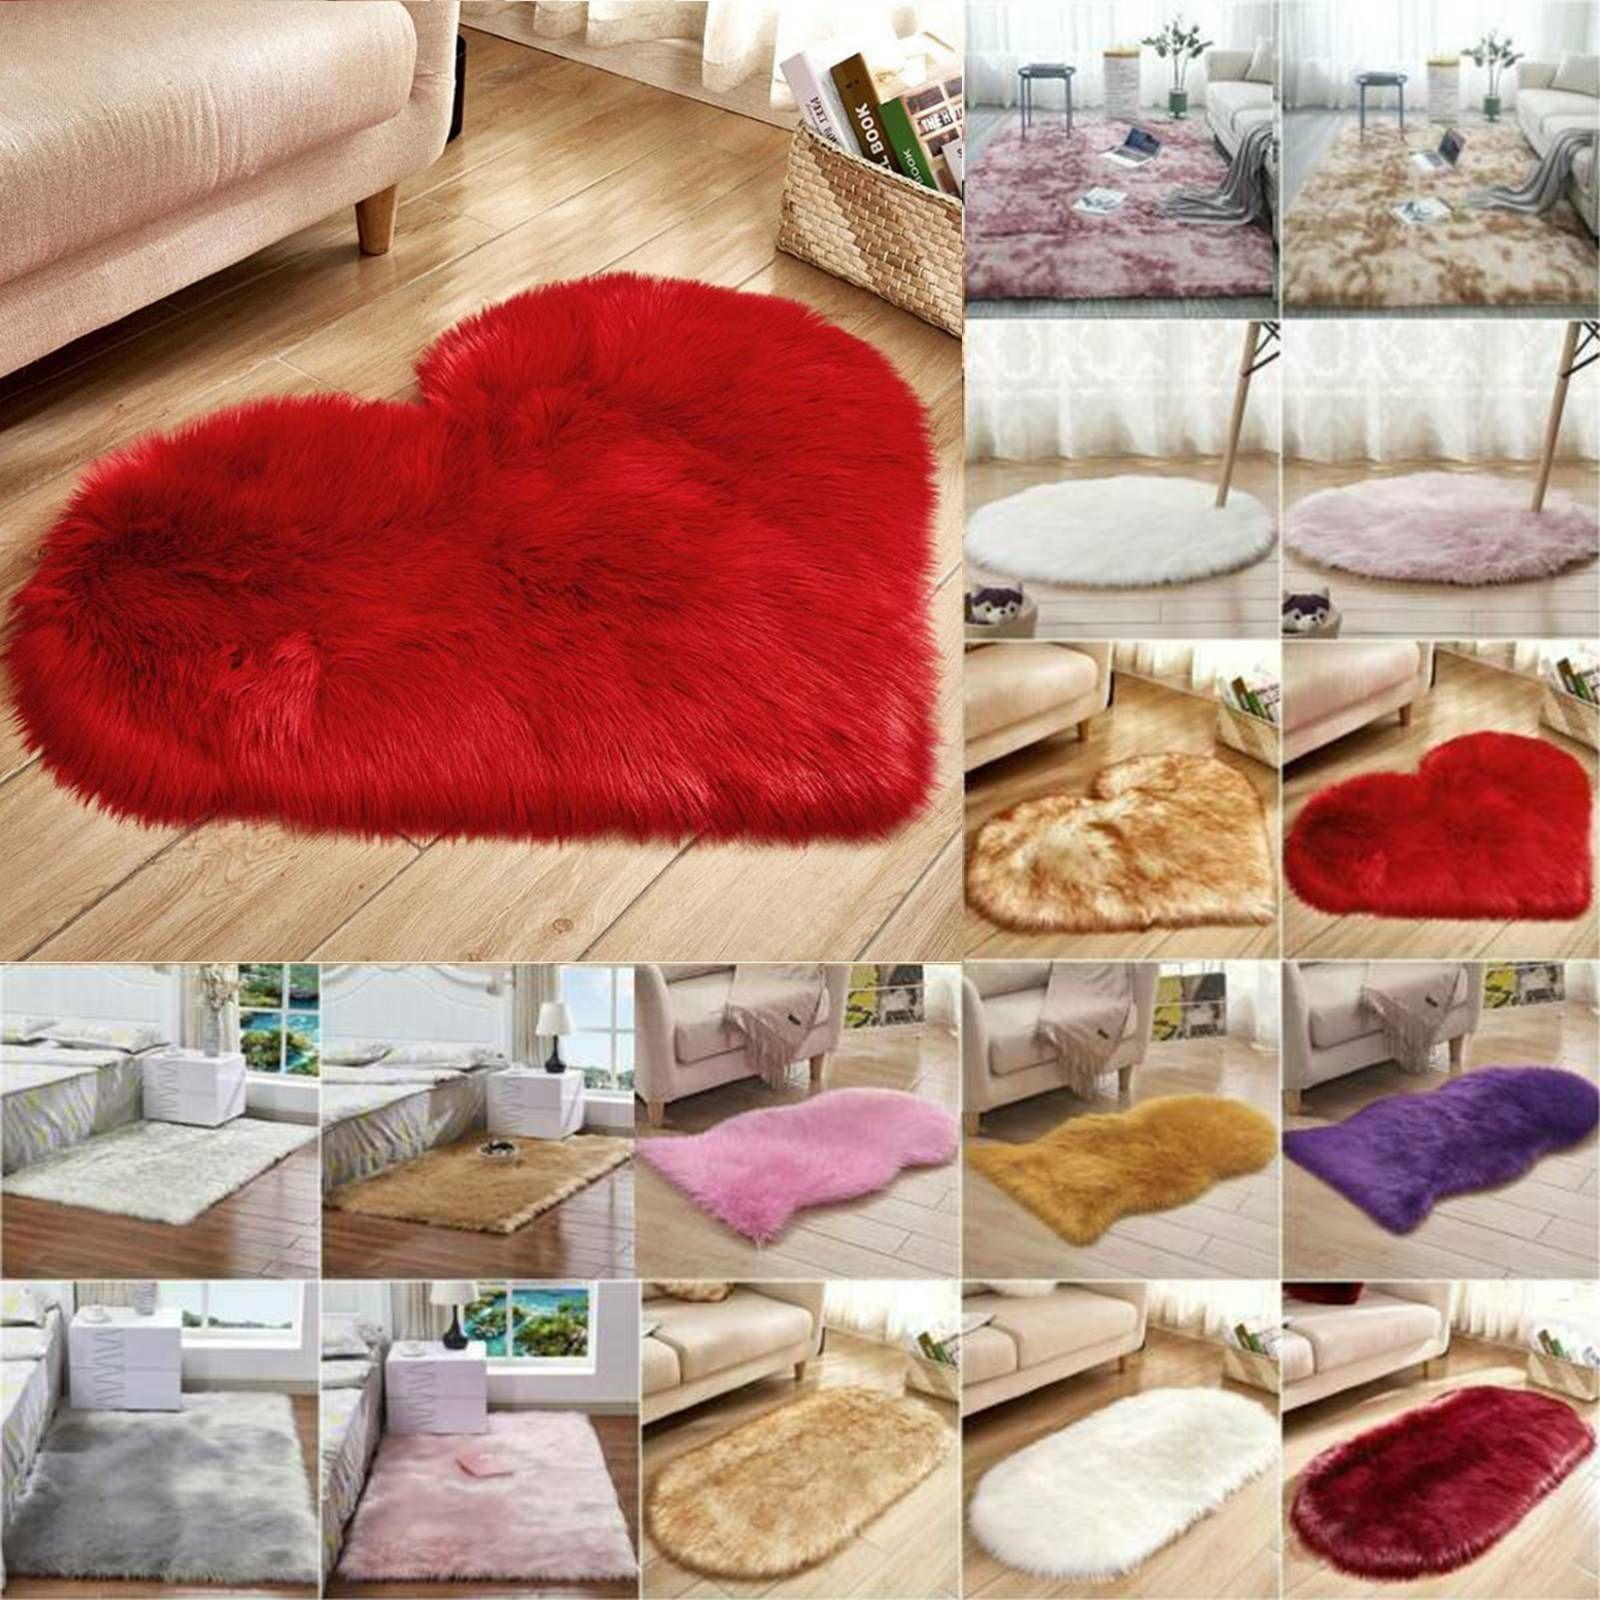 Fluffy Faux Fur Decor Area Rugs Hairy Soft Shaggy Bedroom